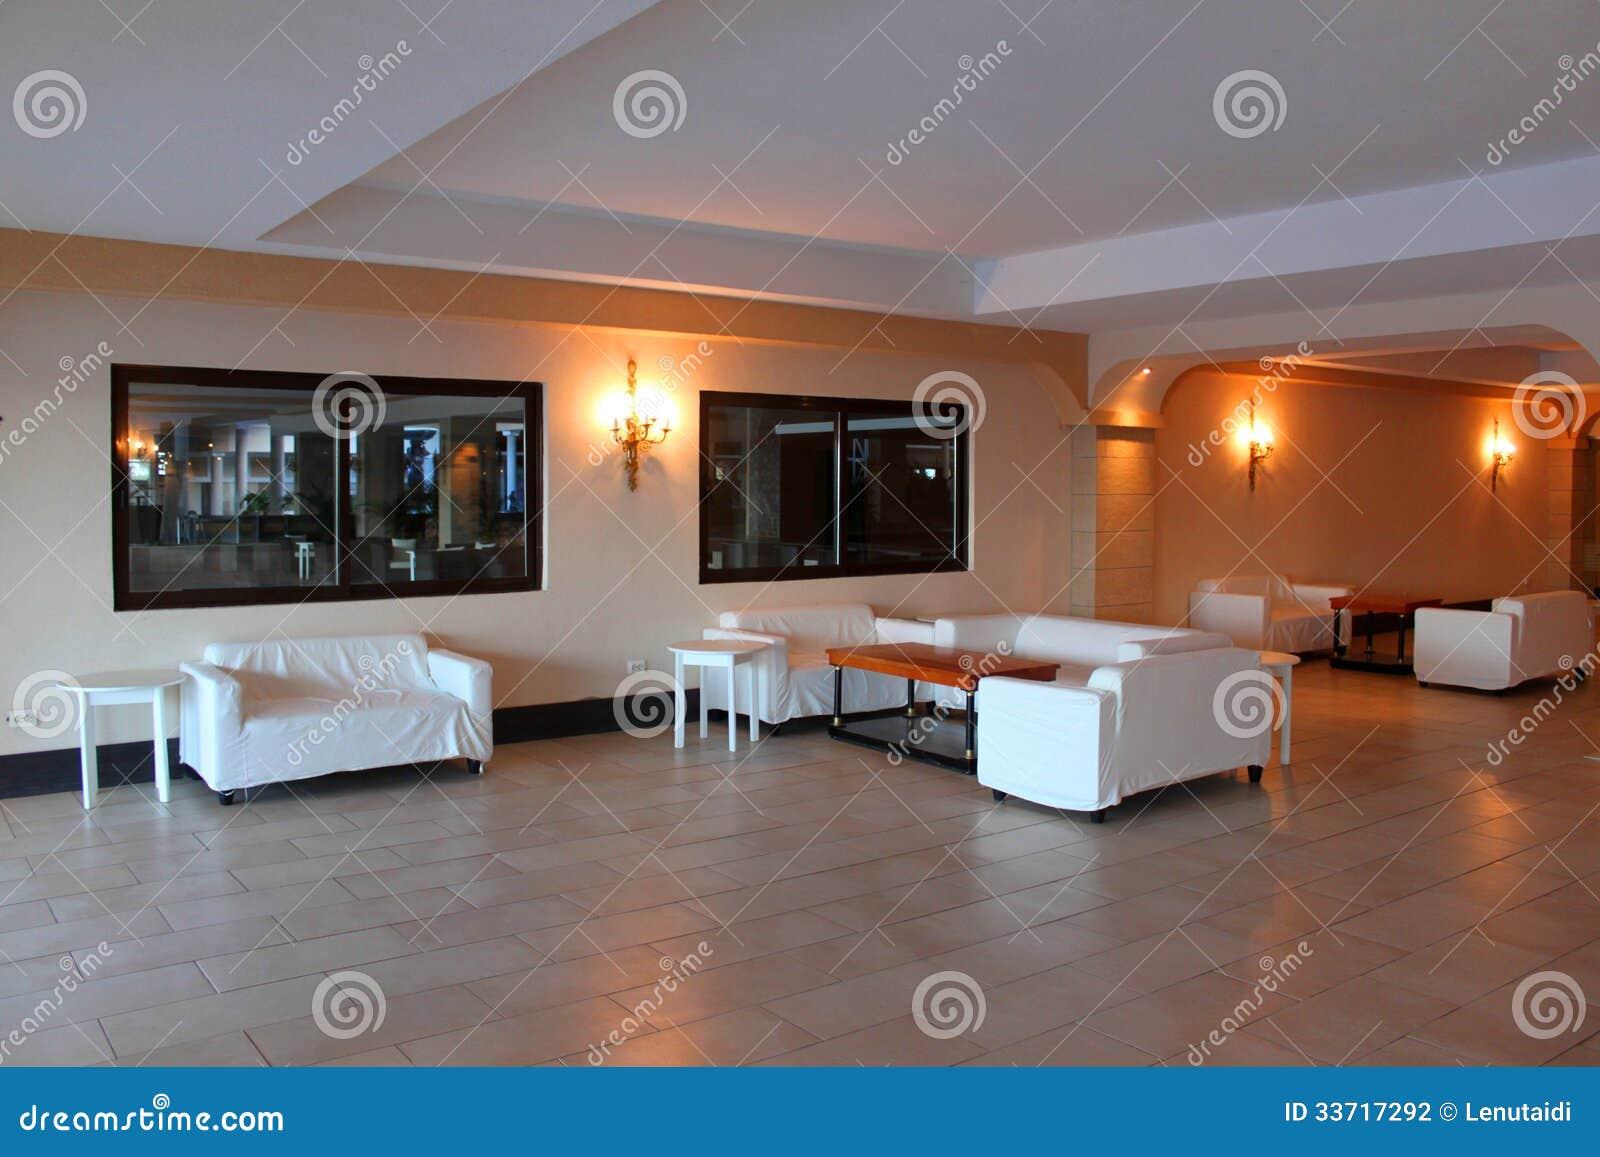 hotel lobby stock photography image 33717292